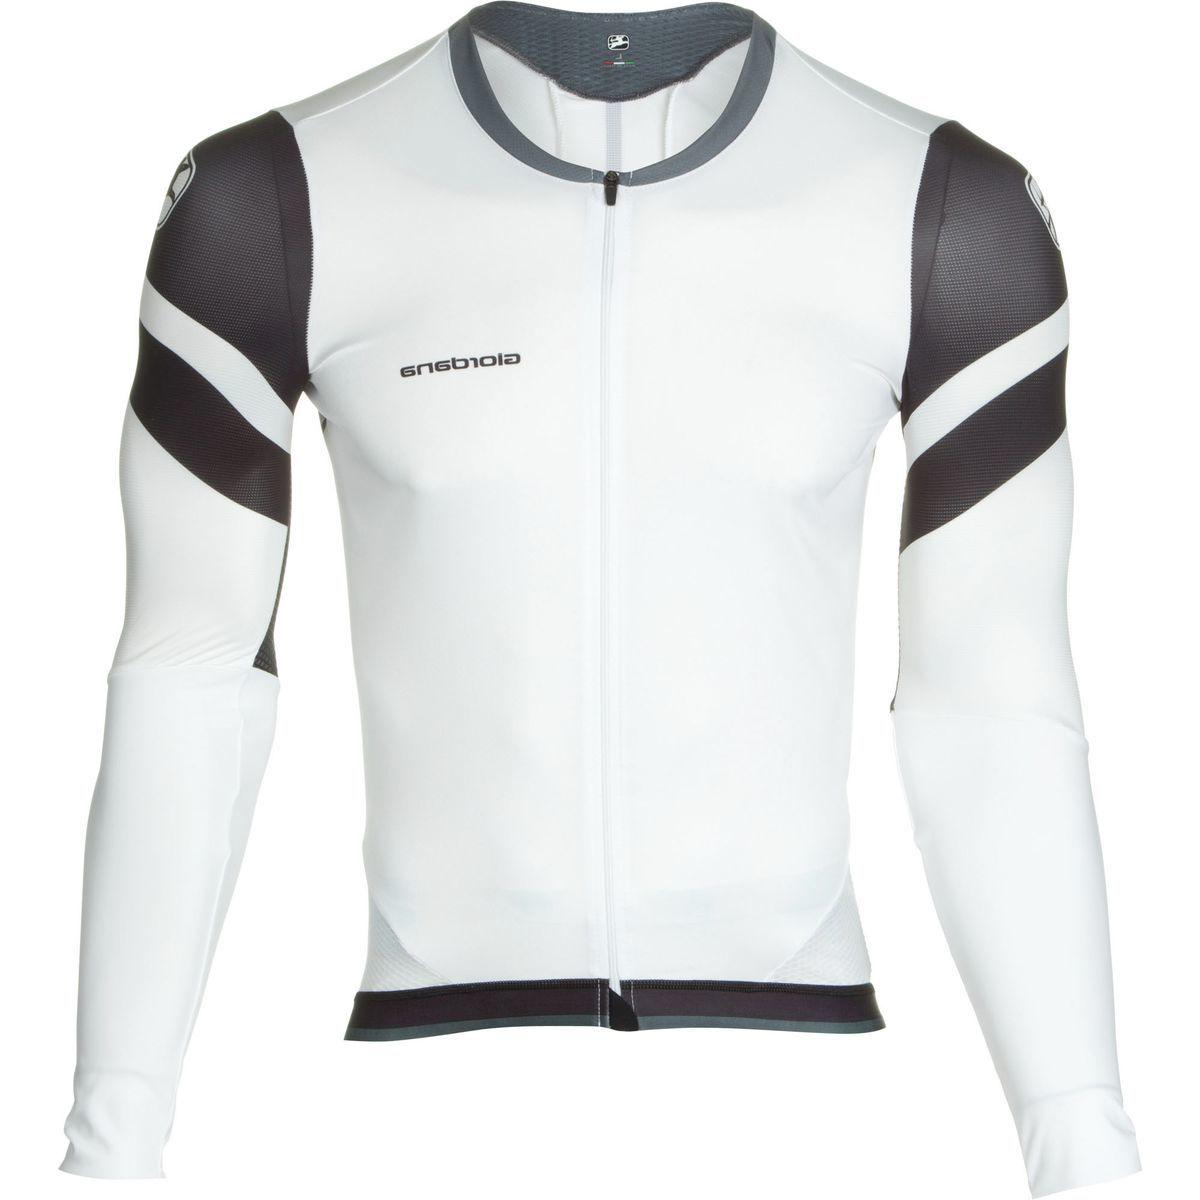 Giordana EXO System Long Sleeve Jersey - Men's